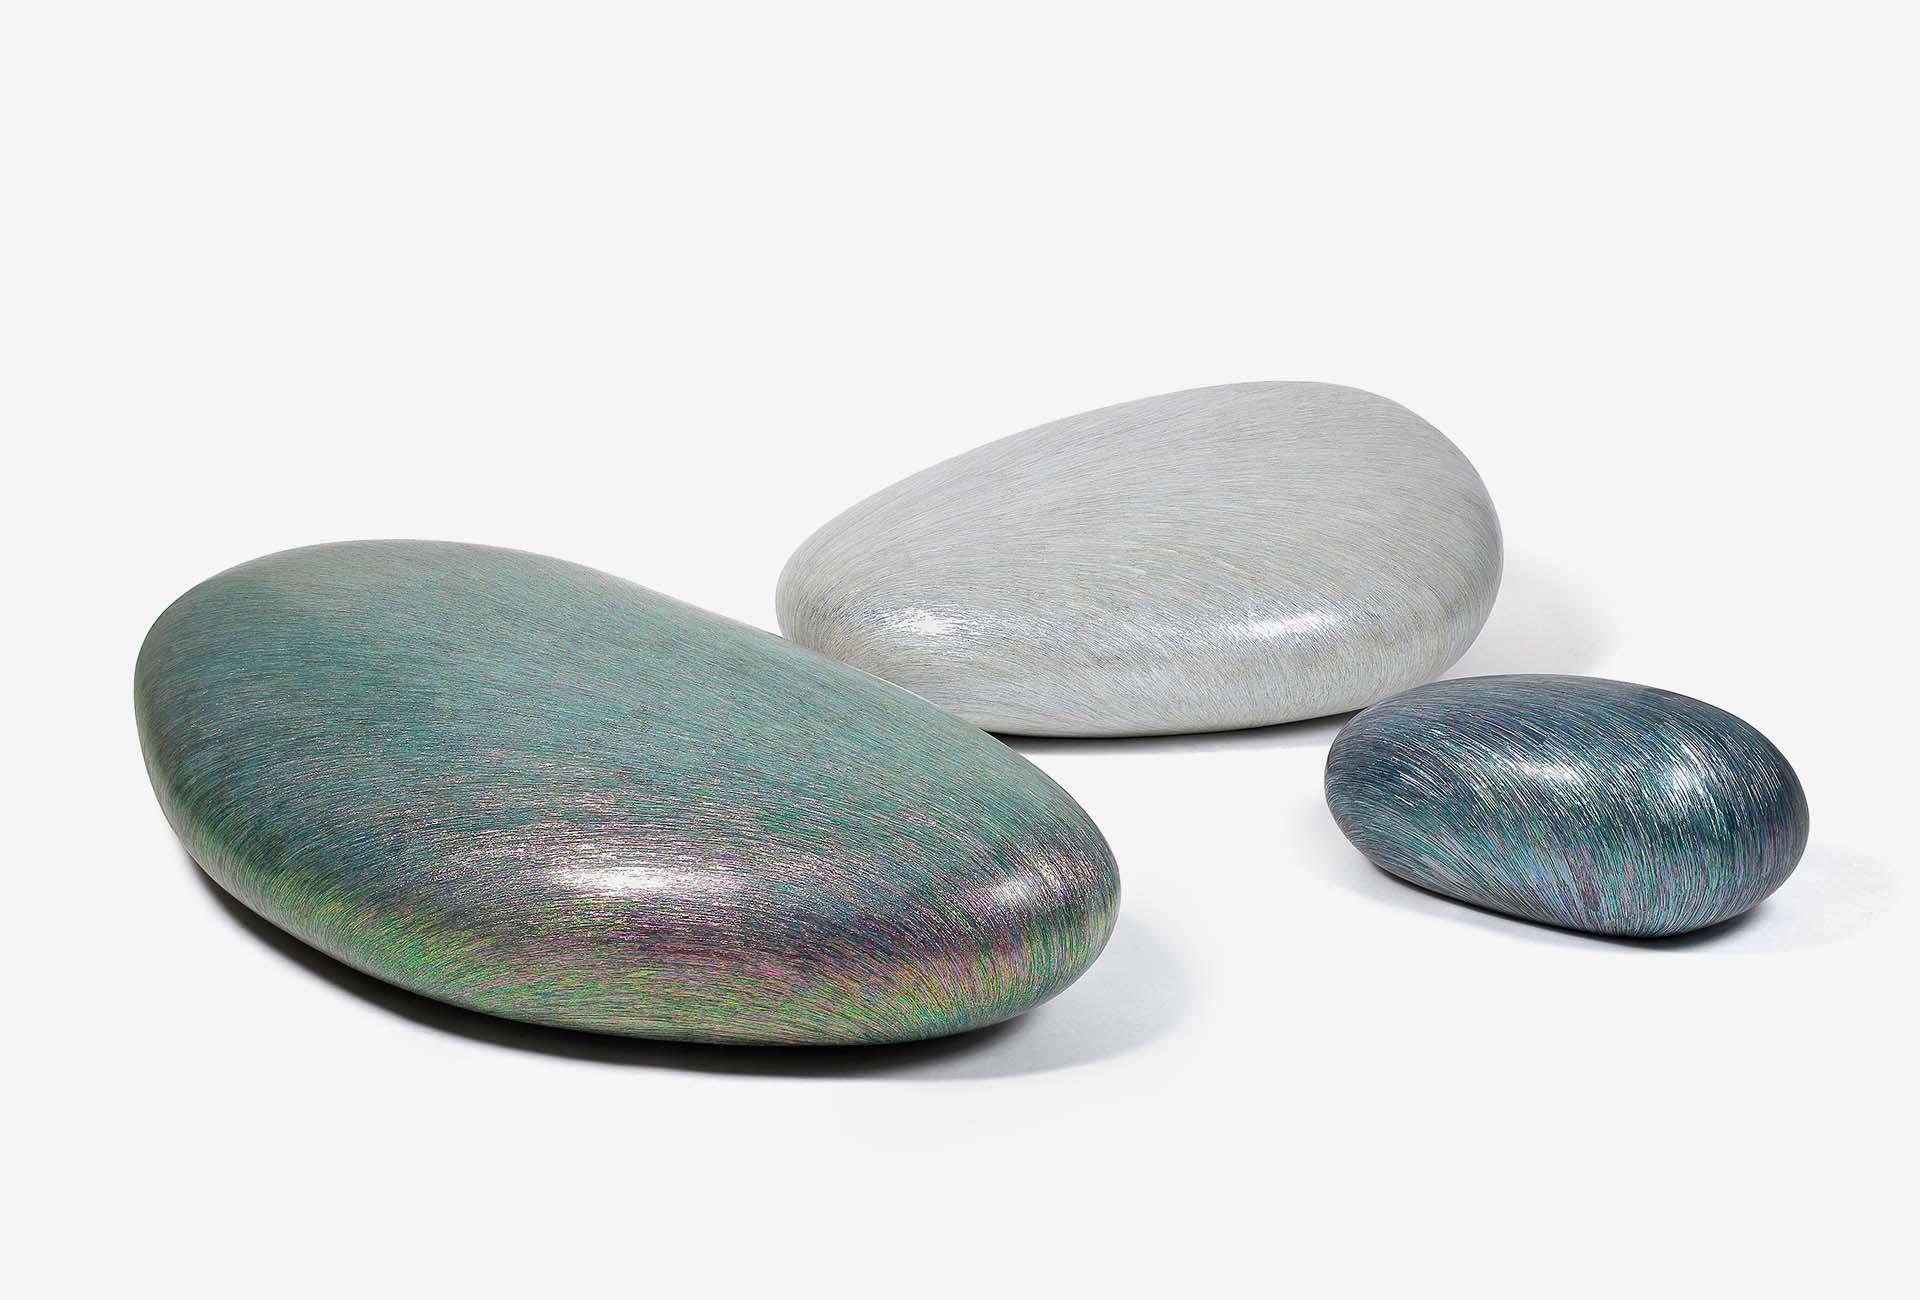 Tresor Basel, Hwang Samyong, Pebbles